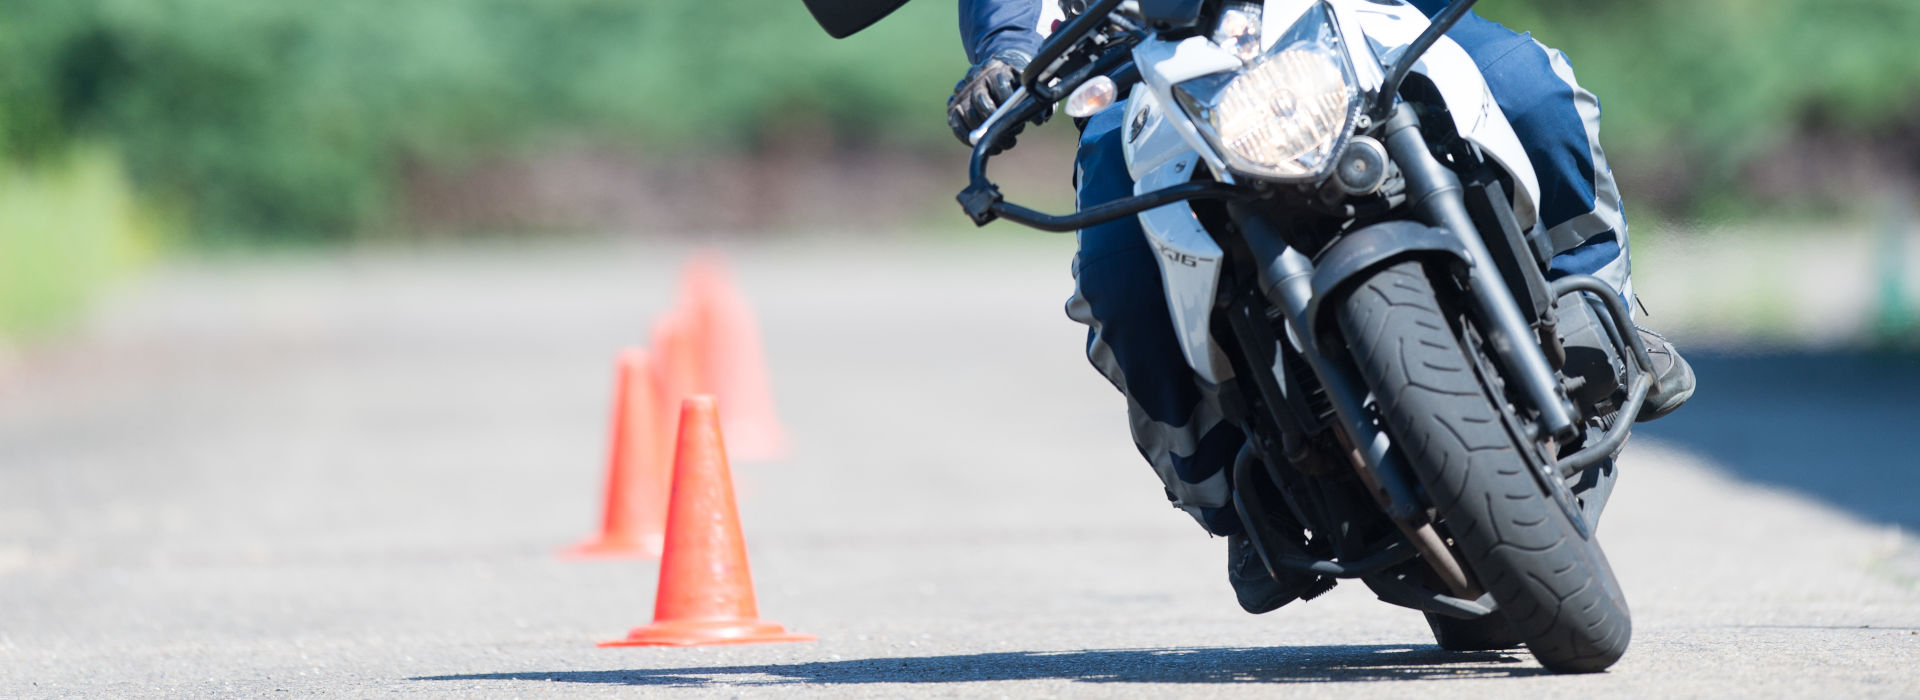 Motorrijbewijspoint Leiderdorp motor rijvaardigheid